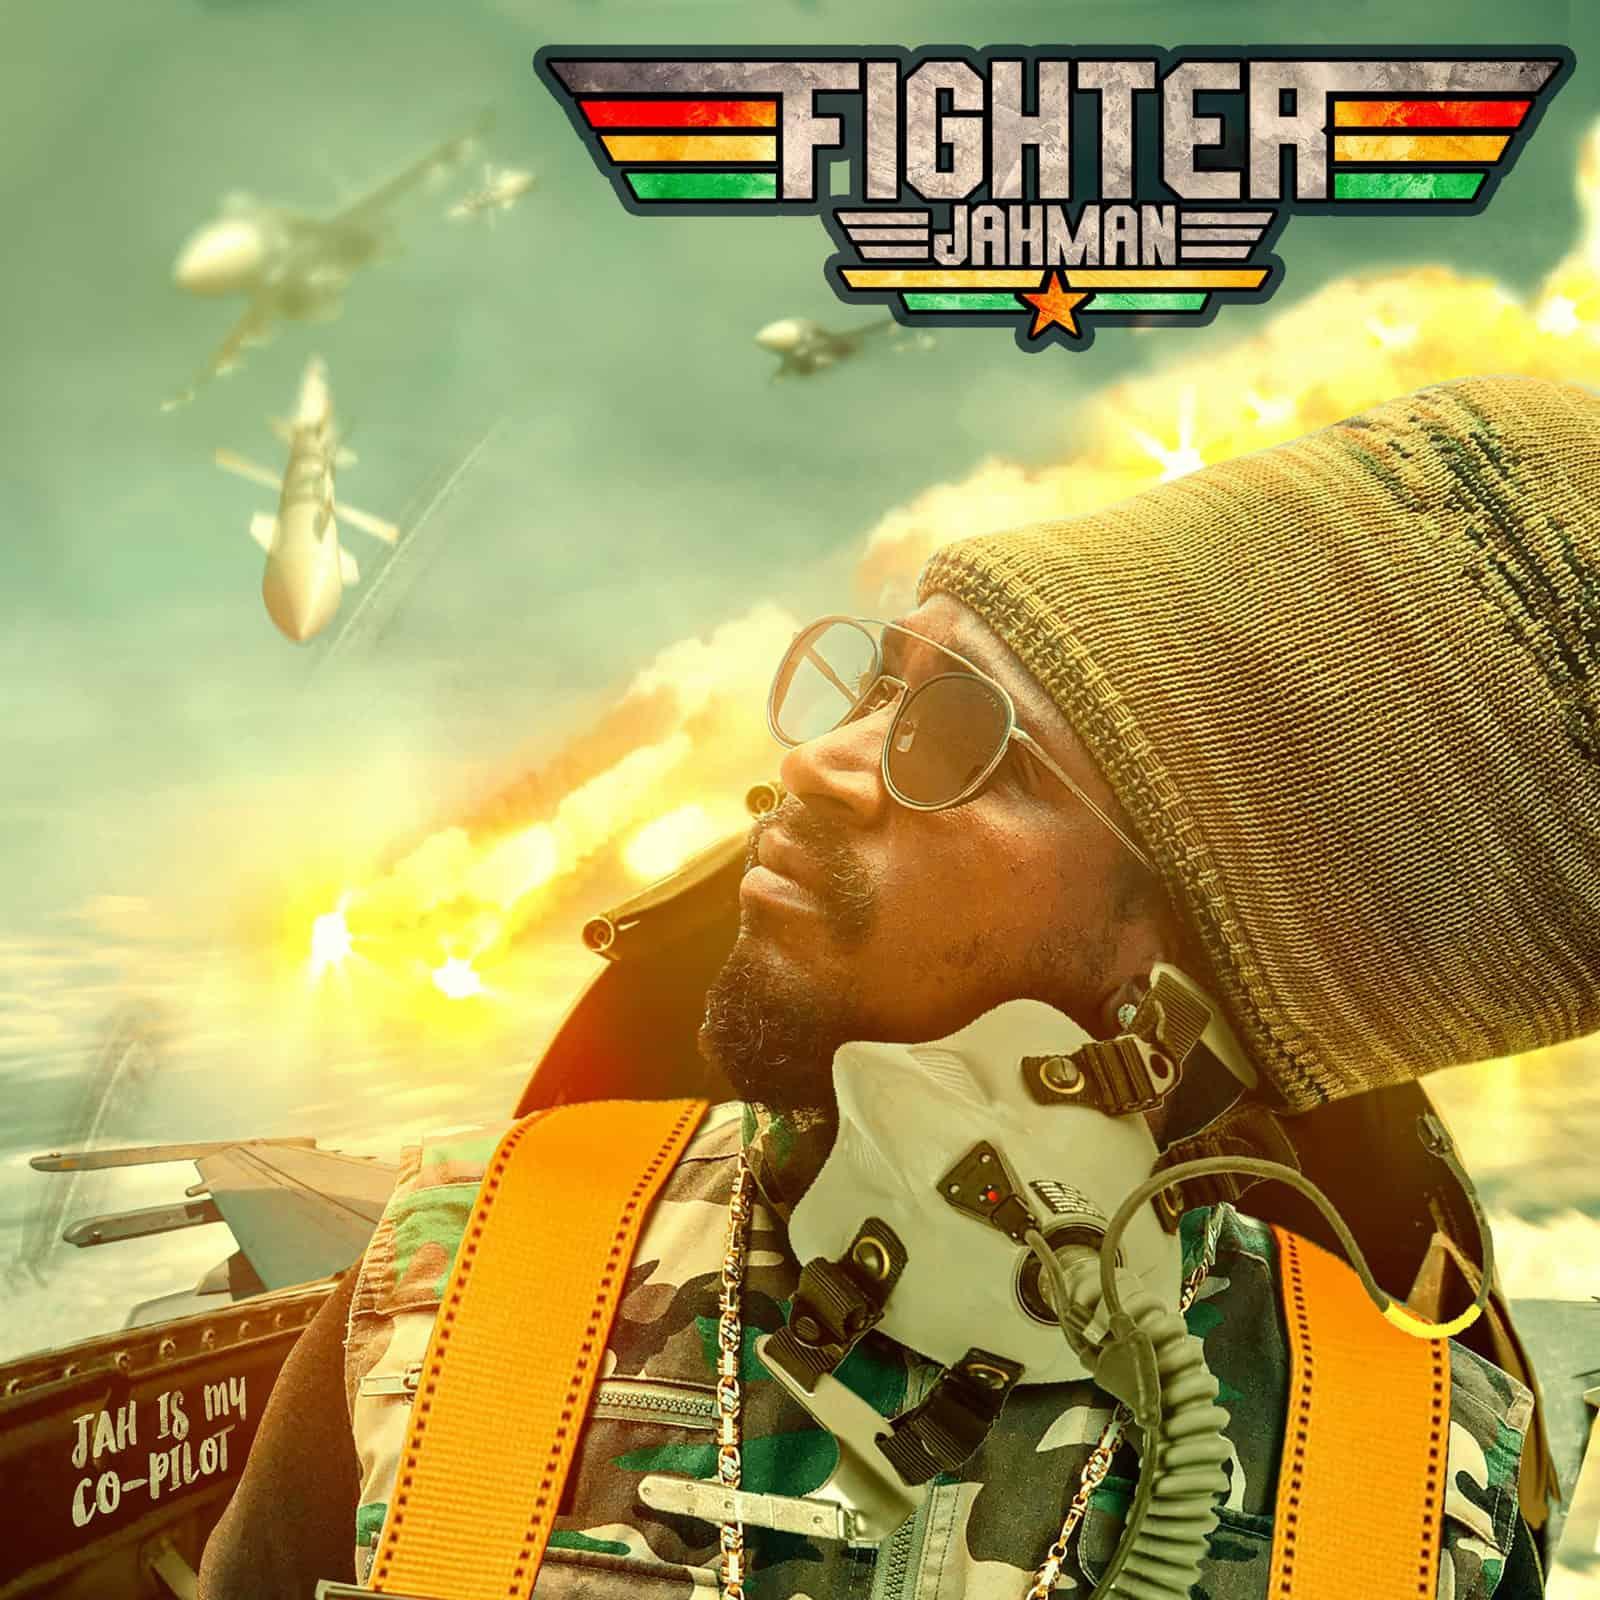 Jahman - Fighter - Splatter House Records